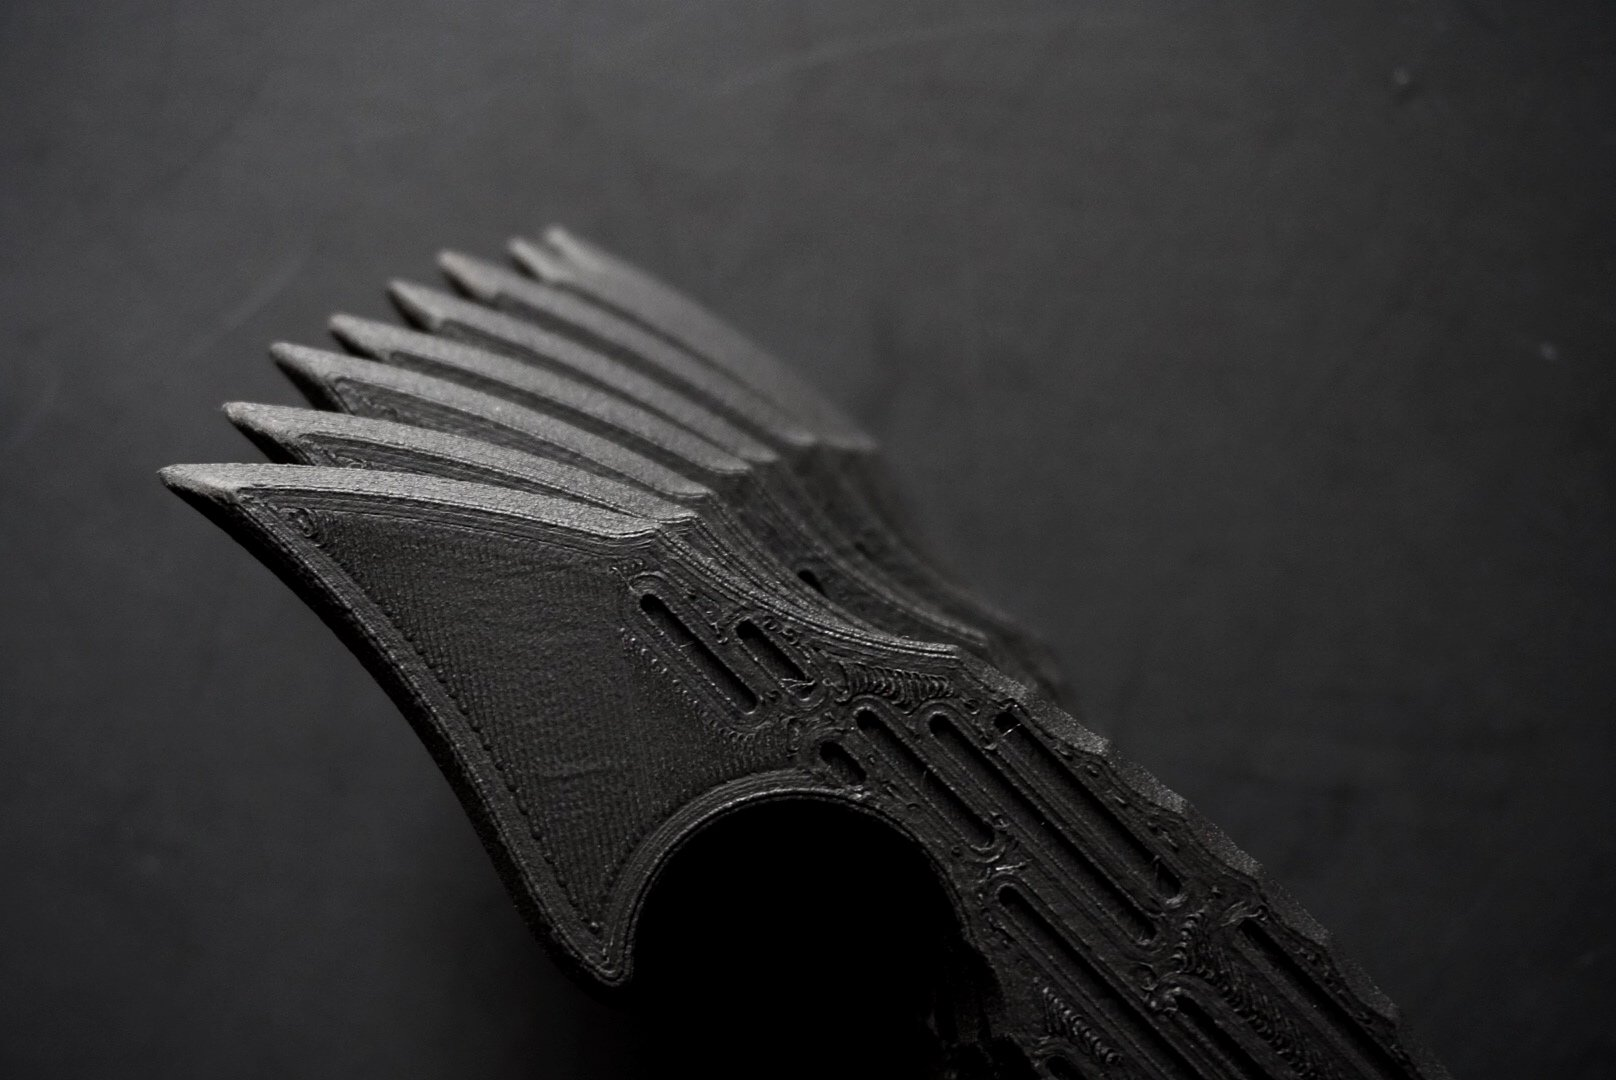 dull boy blades fang 3d printed knife knives non metallic tool